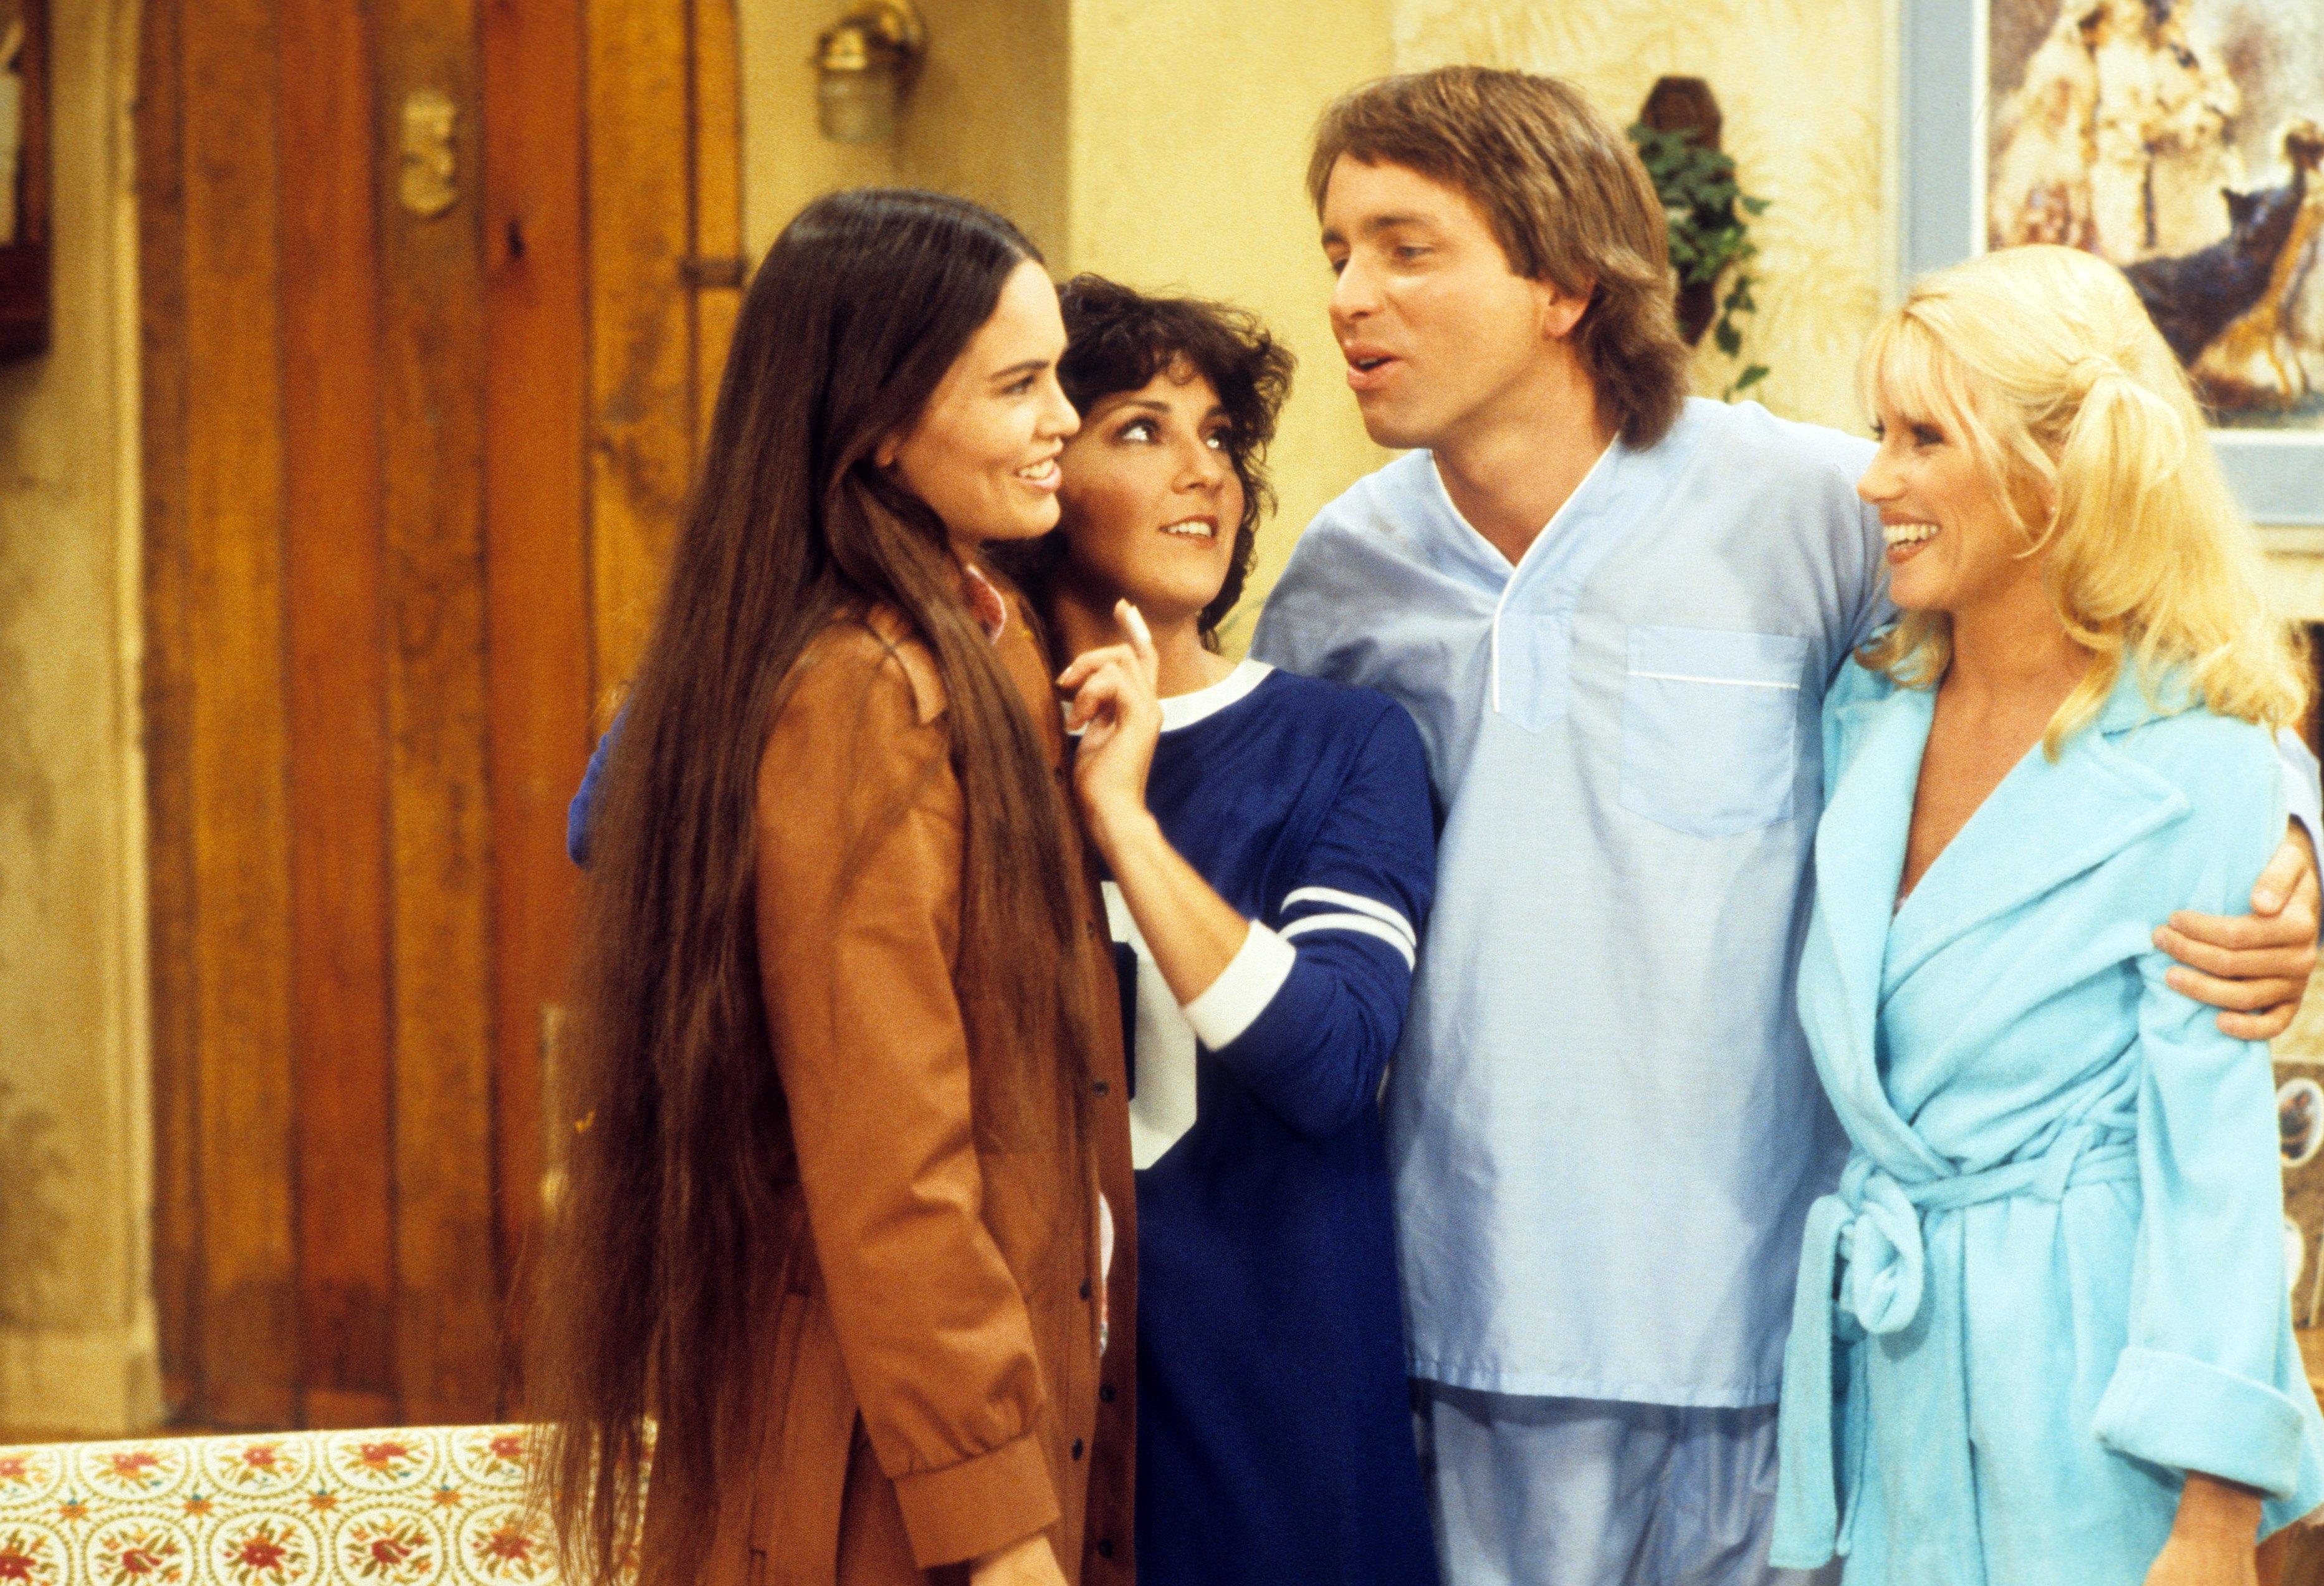 John Ritter, Suzanne Somers, Joyce DeWitt, and Devon Ericson in Three's Company (1976)